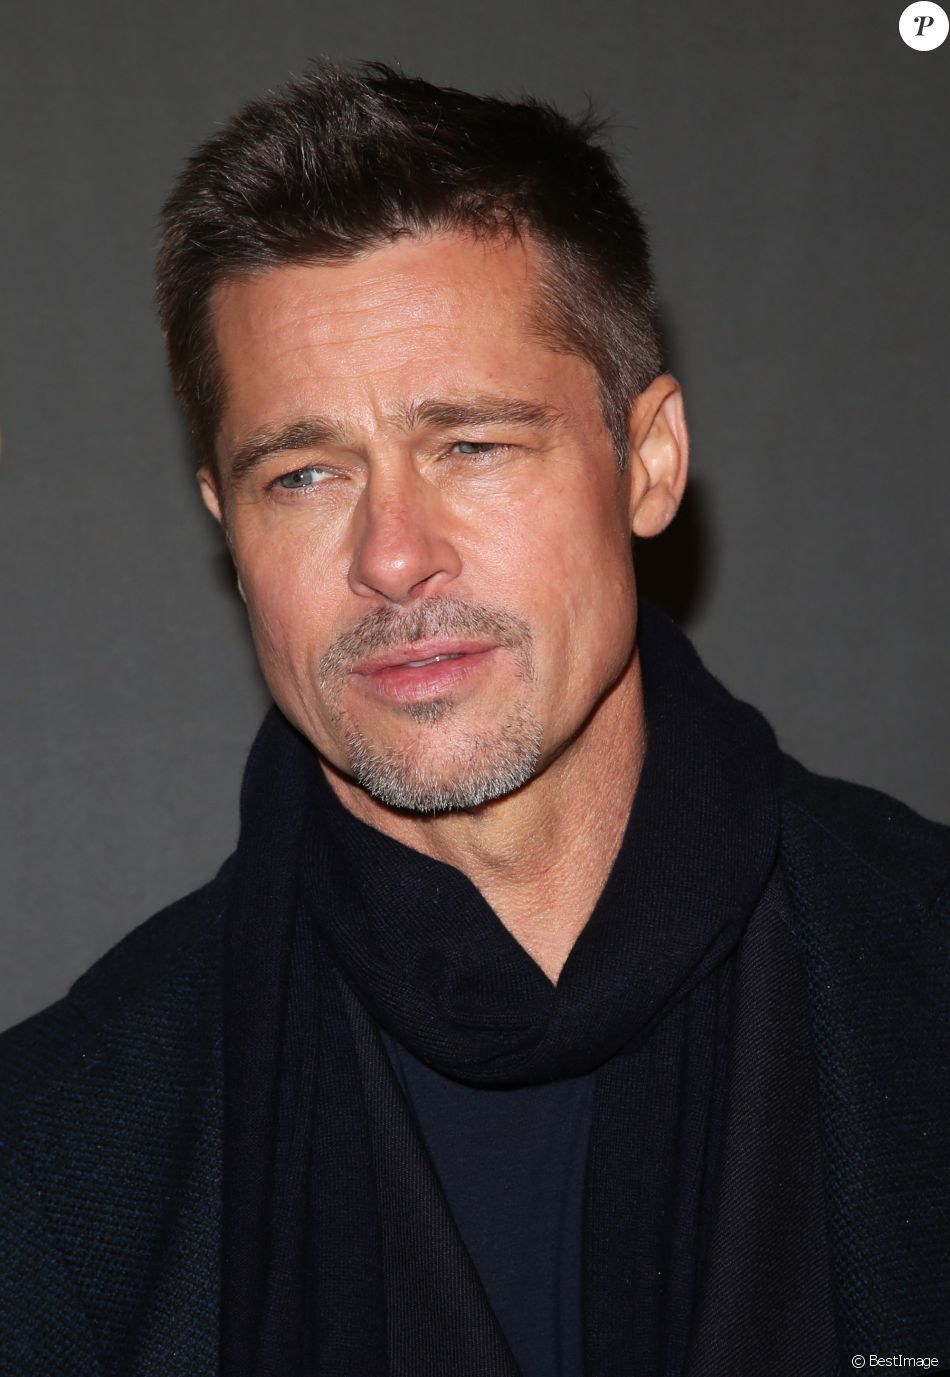 3041852 Brad Pitt Avant Premiere Du Film Alli 950x0 1 Jpg 950 1377 Brad Pitt Brad Pitt Haircut Brad And Angelina